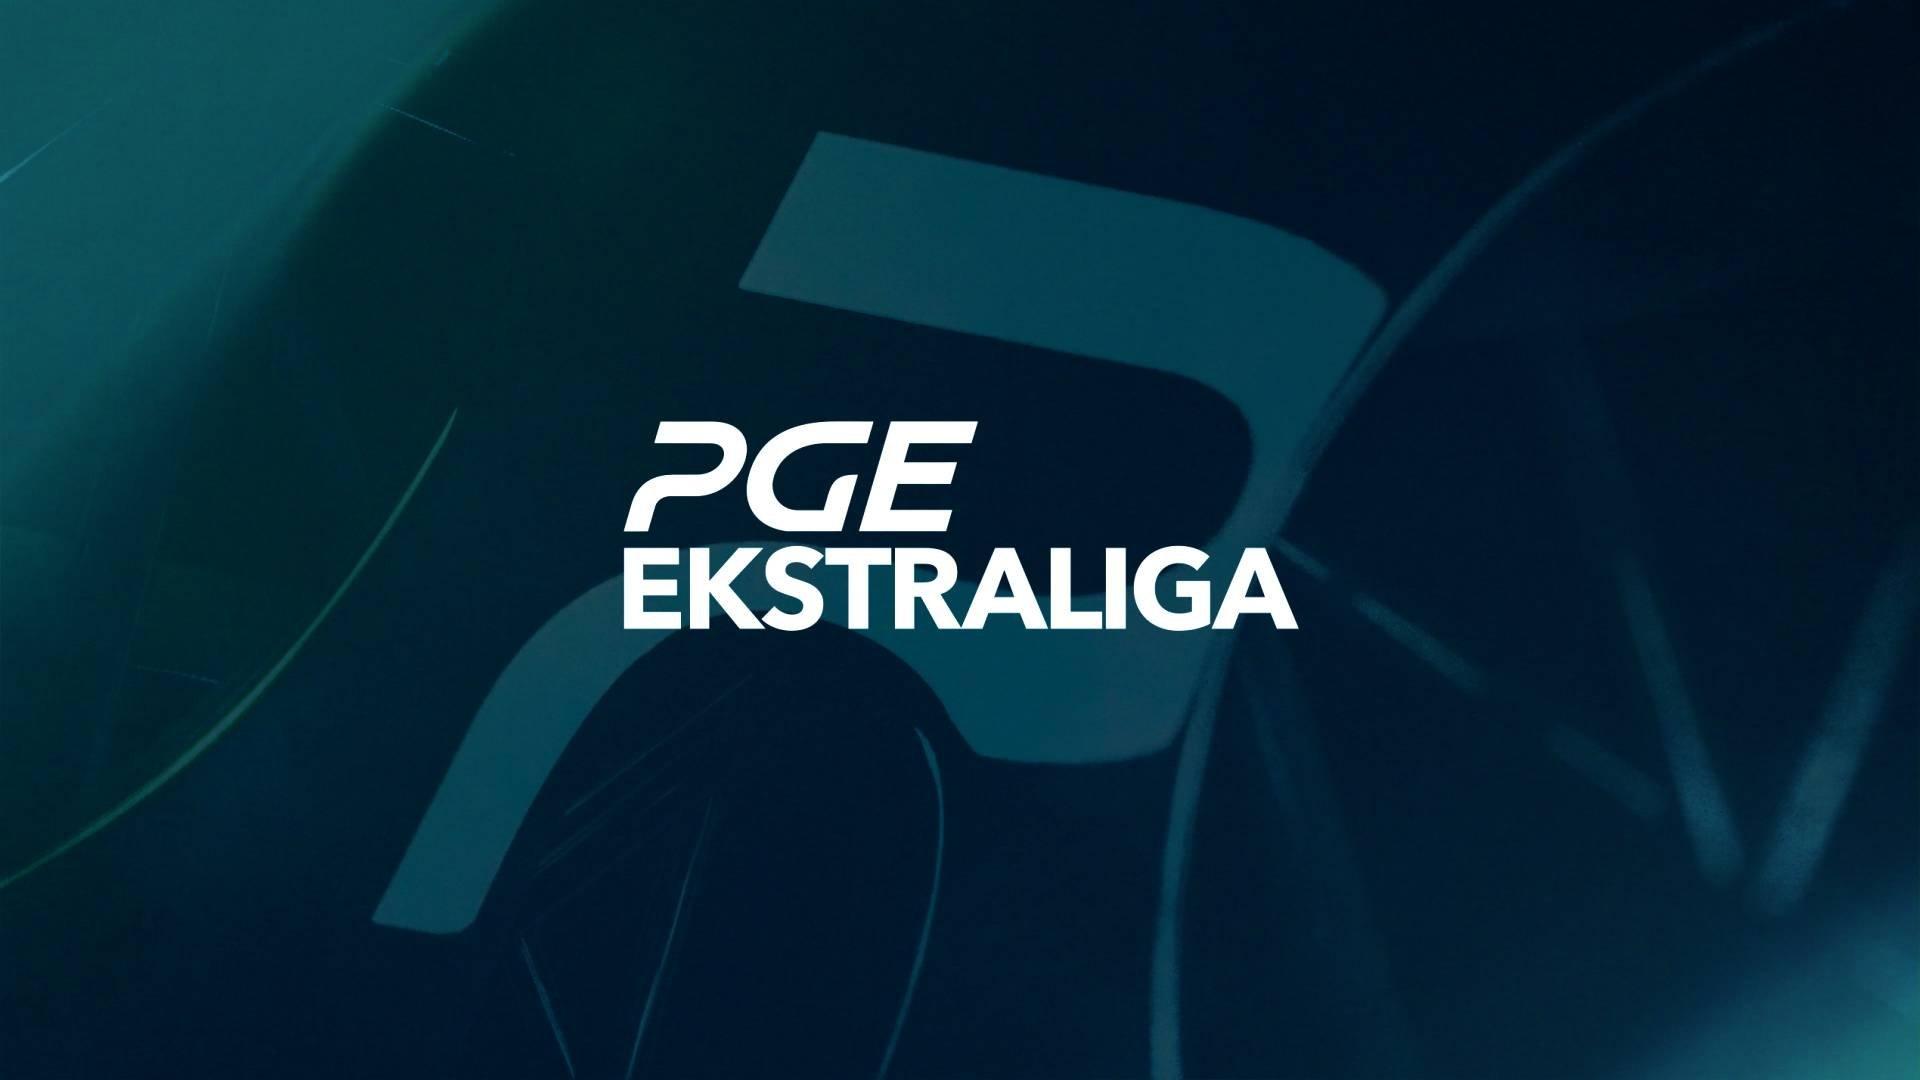 Promo PGE Ekstraliga 2021